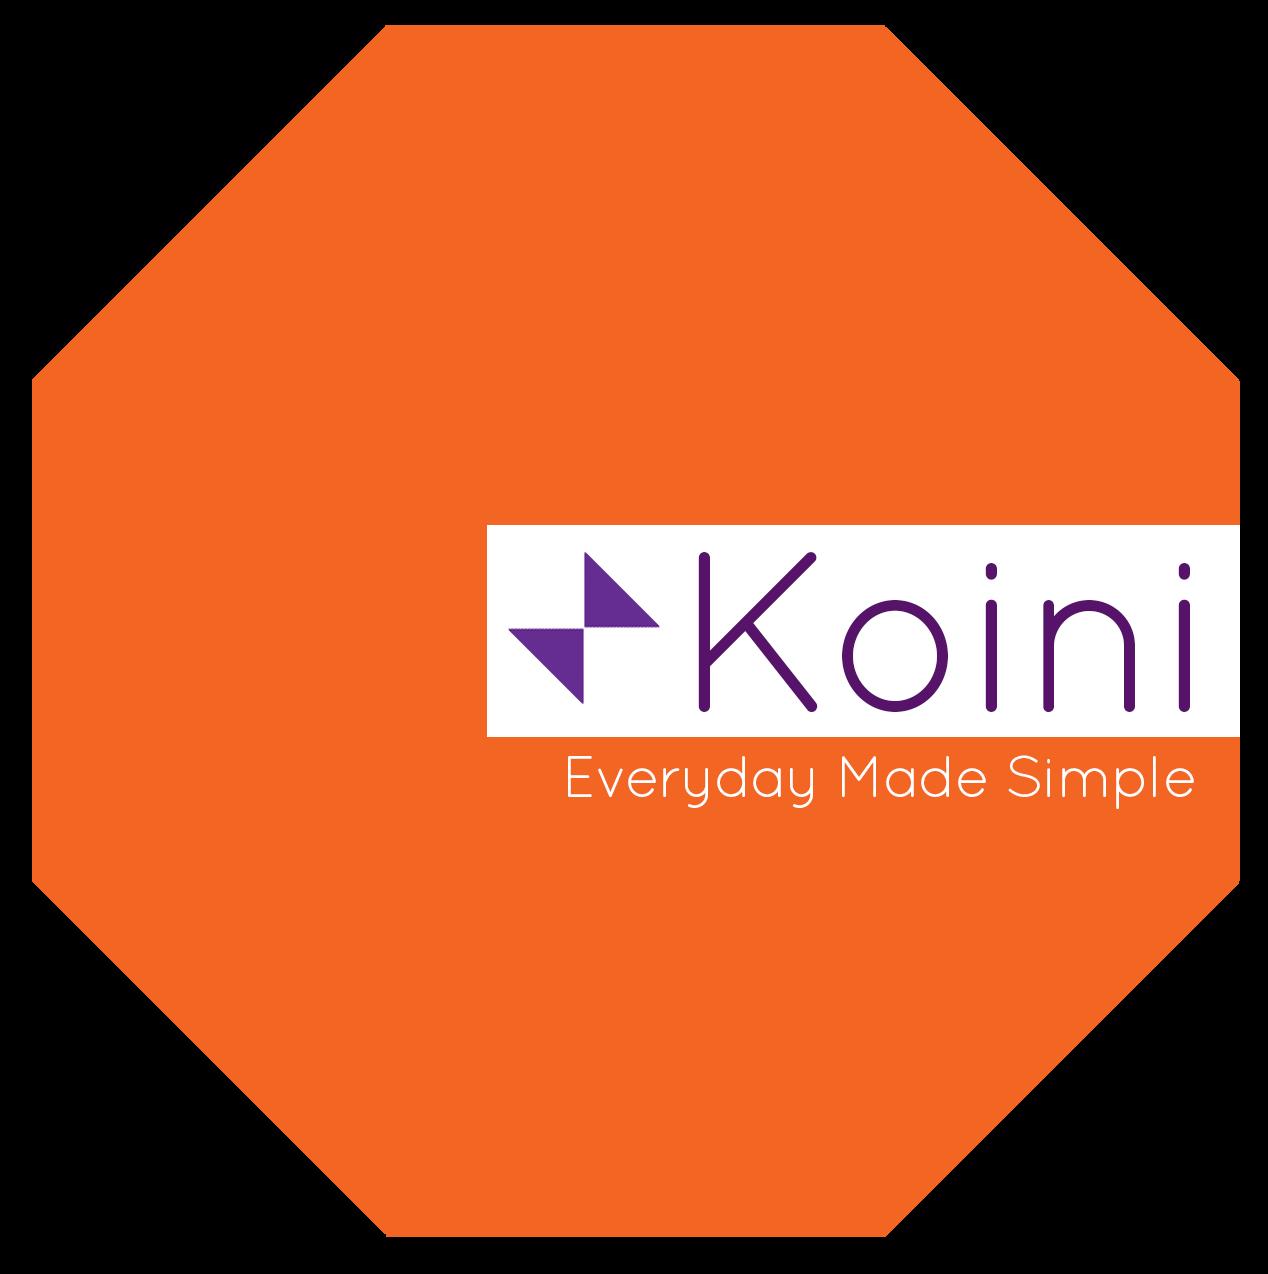 /srv/www/vhosts/user3101/html/entrepreneurship-campus.org/wp-content/uploads/2019/05/Koini-logo.png